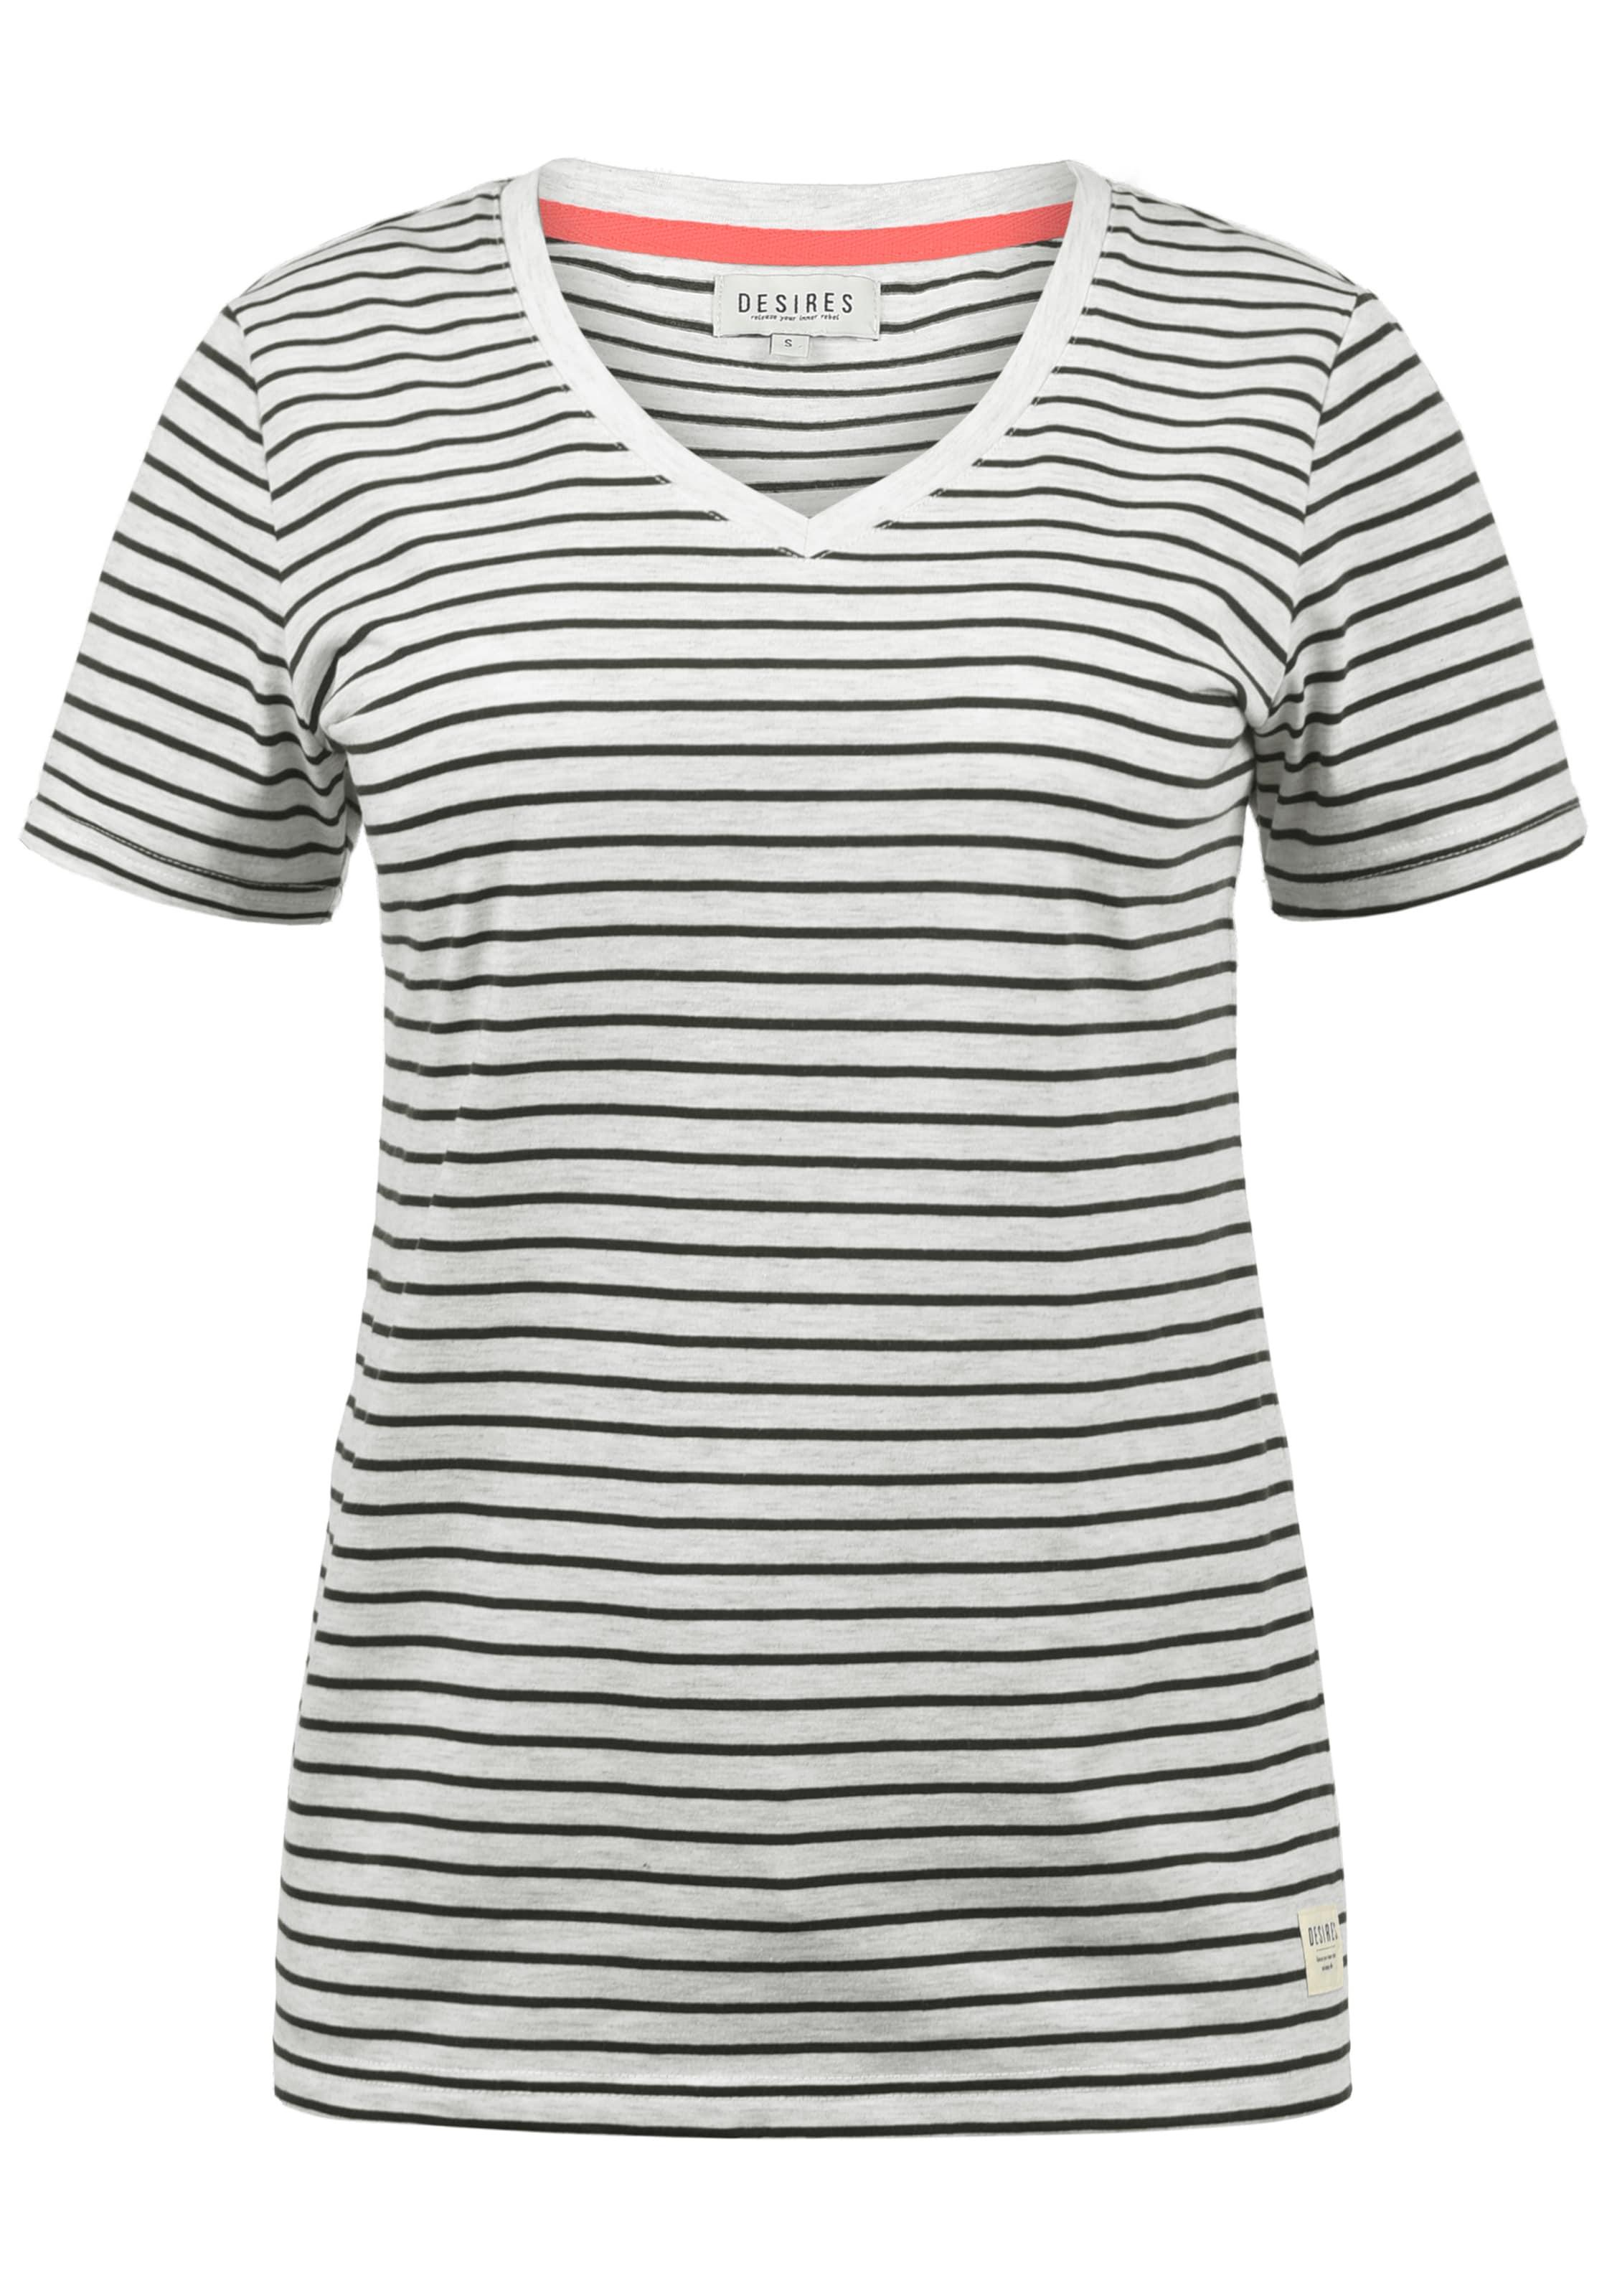 T In Desires SchwarzWeiß 'melina' shirt q4L3R5Aj